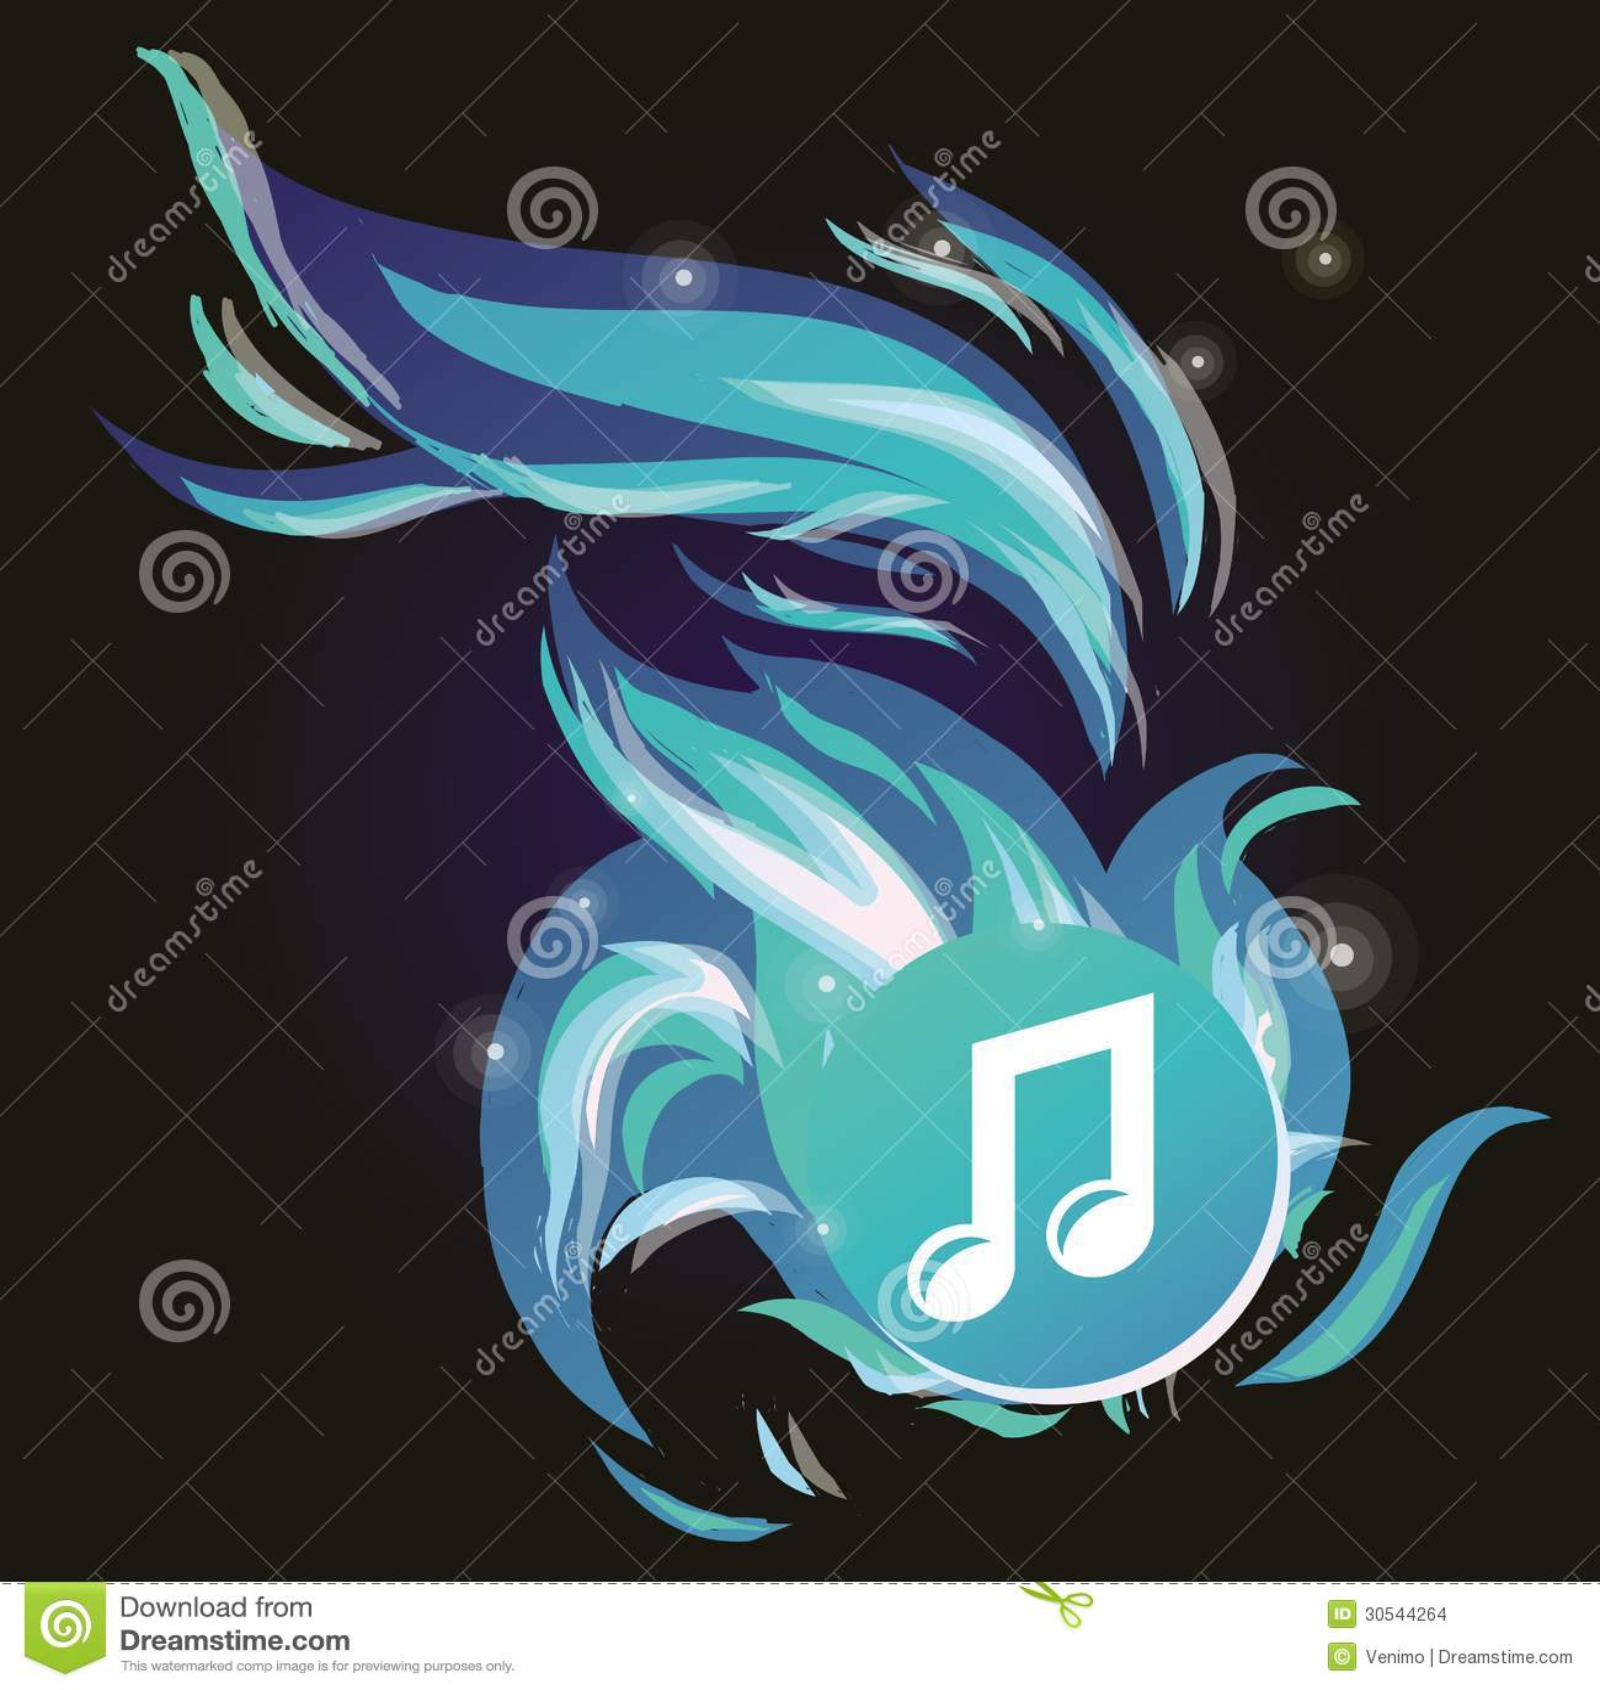 Vektormusikanmerkung mit kalter blauer Flamme